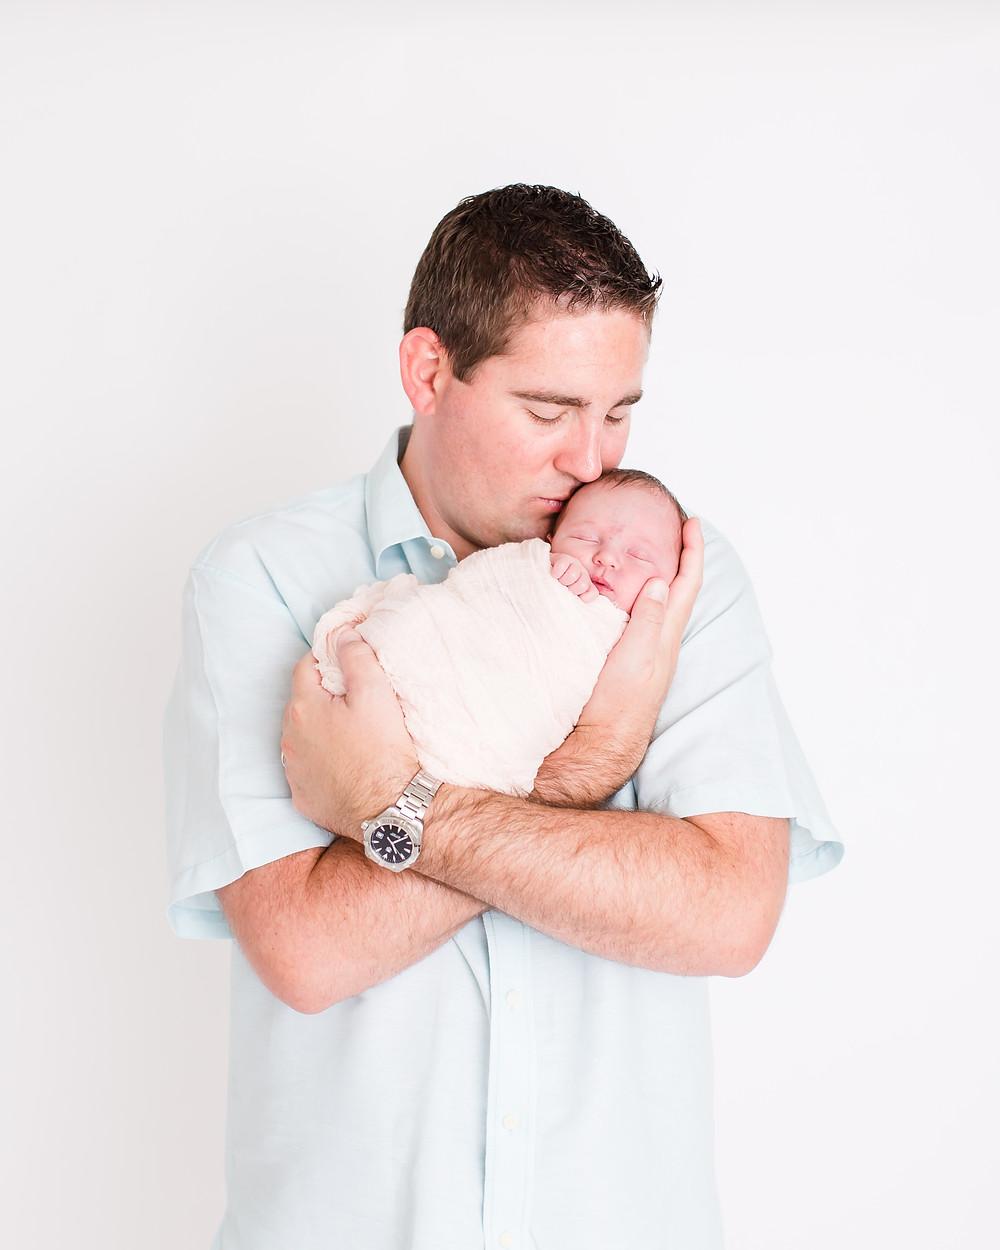 portraits of newborn baby